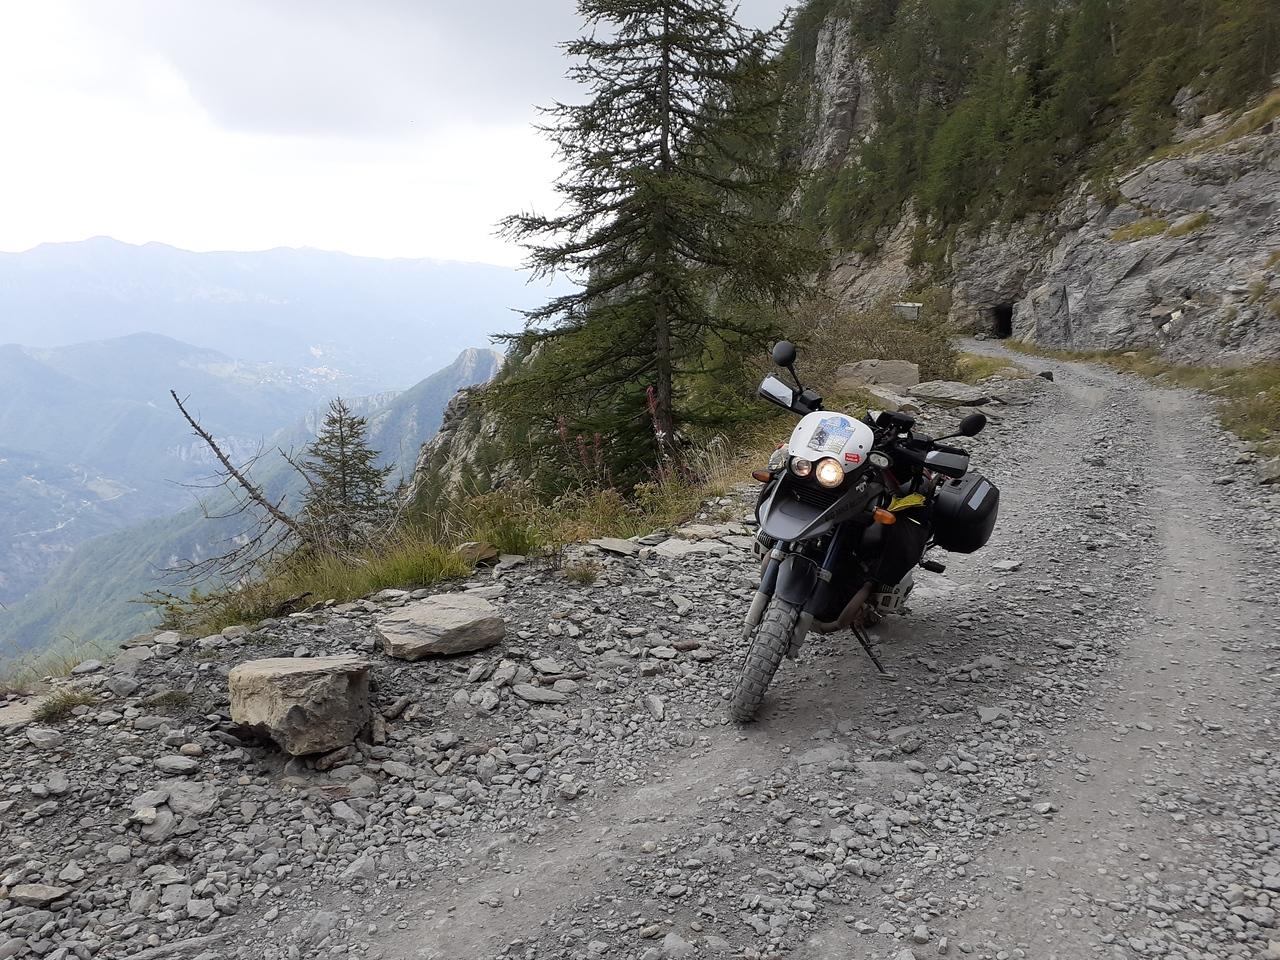 Beklimming via Lago Tenarda naar Baisse di Sanson. Zonder sneeuw